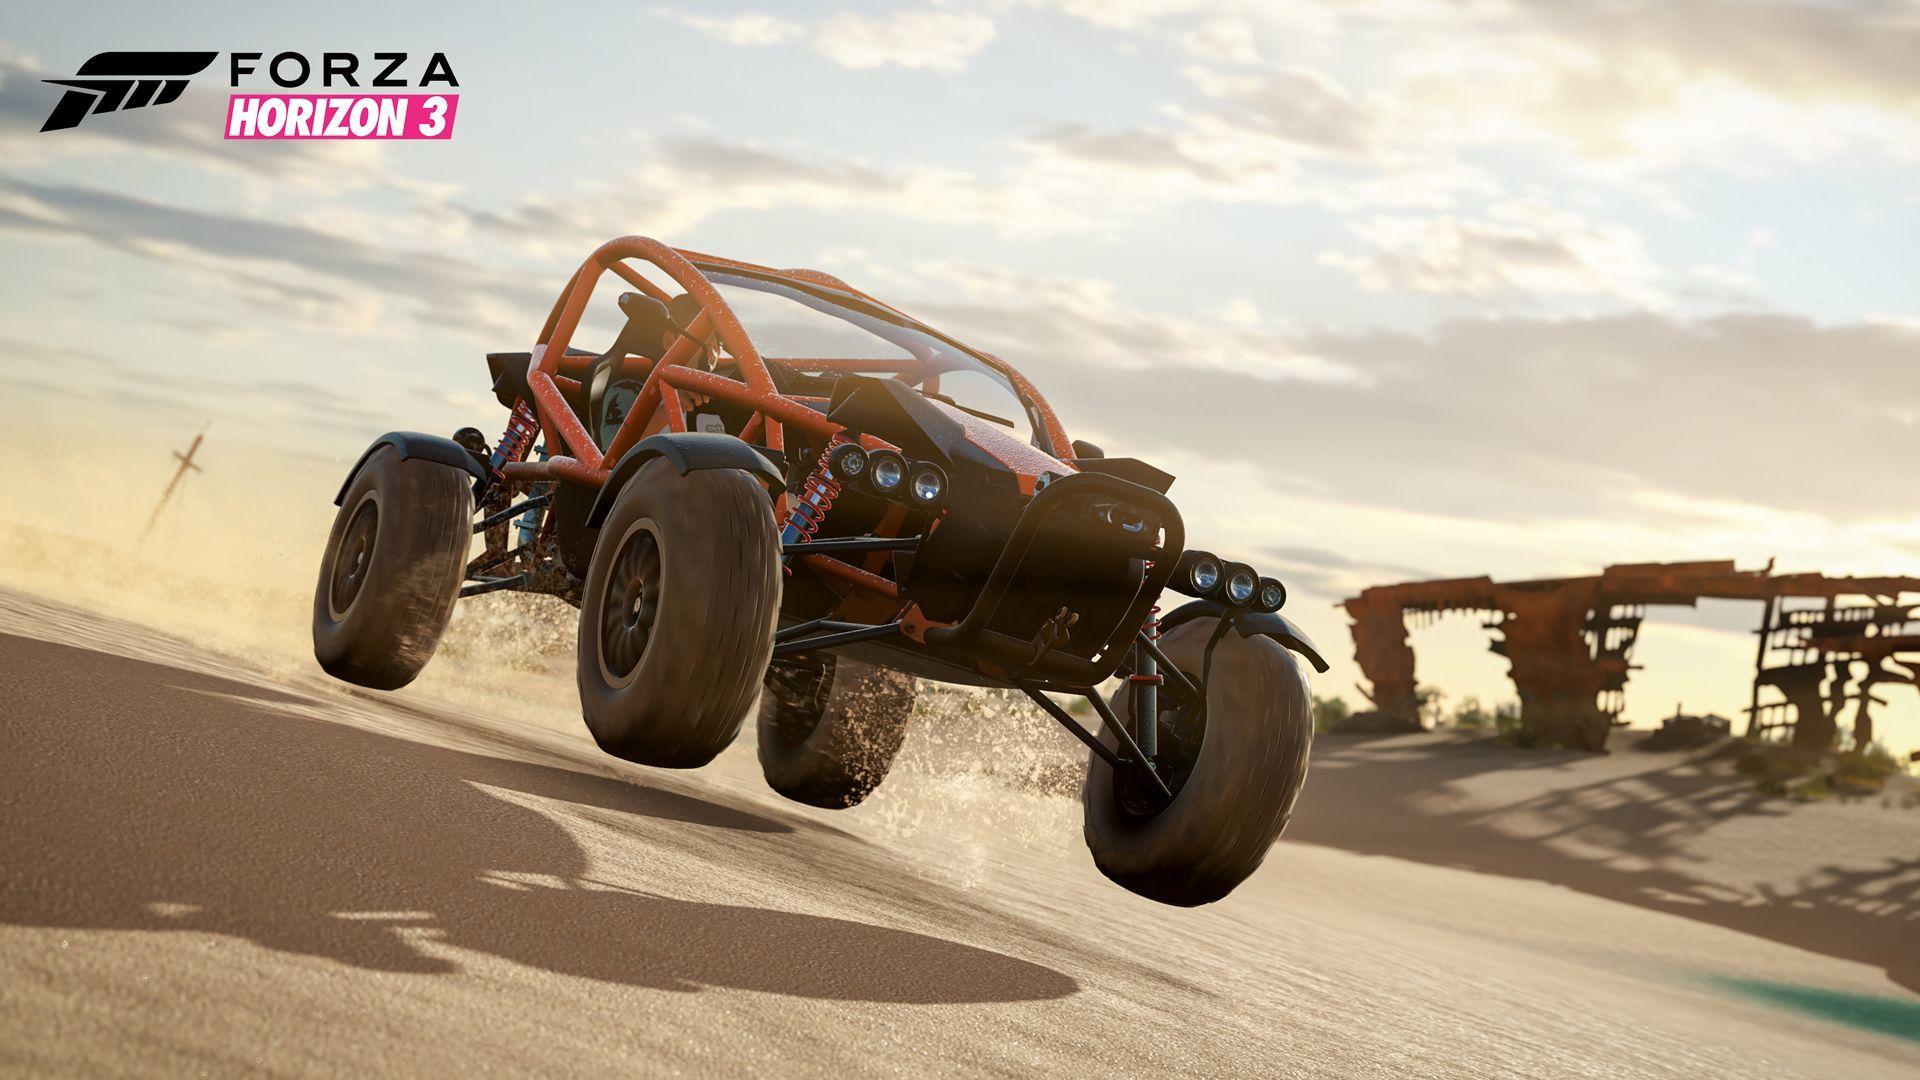 Best Dirt Car In Forza Horizon